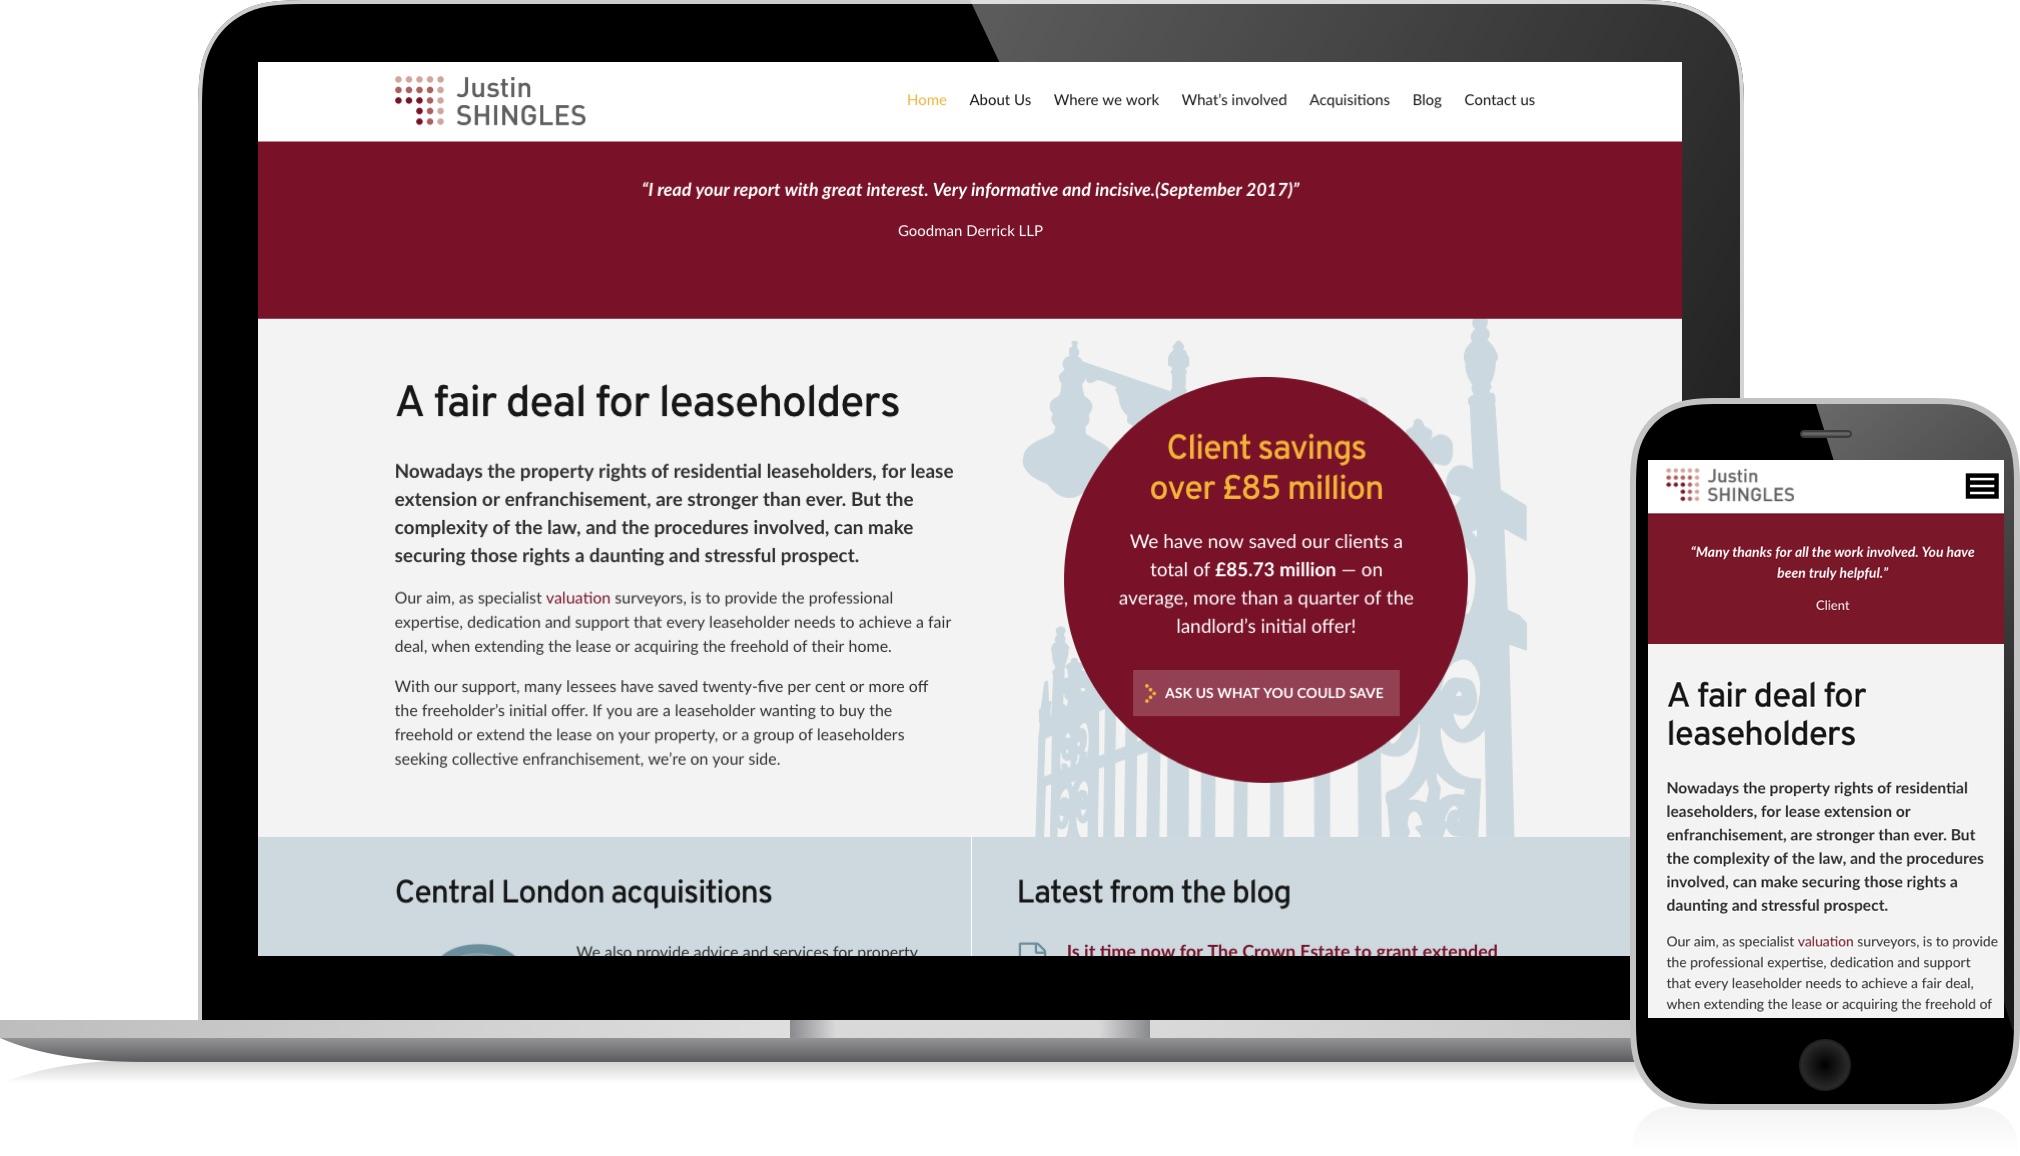 Justin Shingles Ltd. - website design and development by HeavyGuru, London